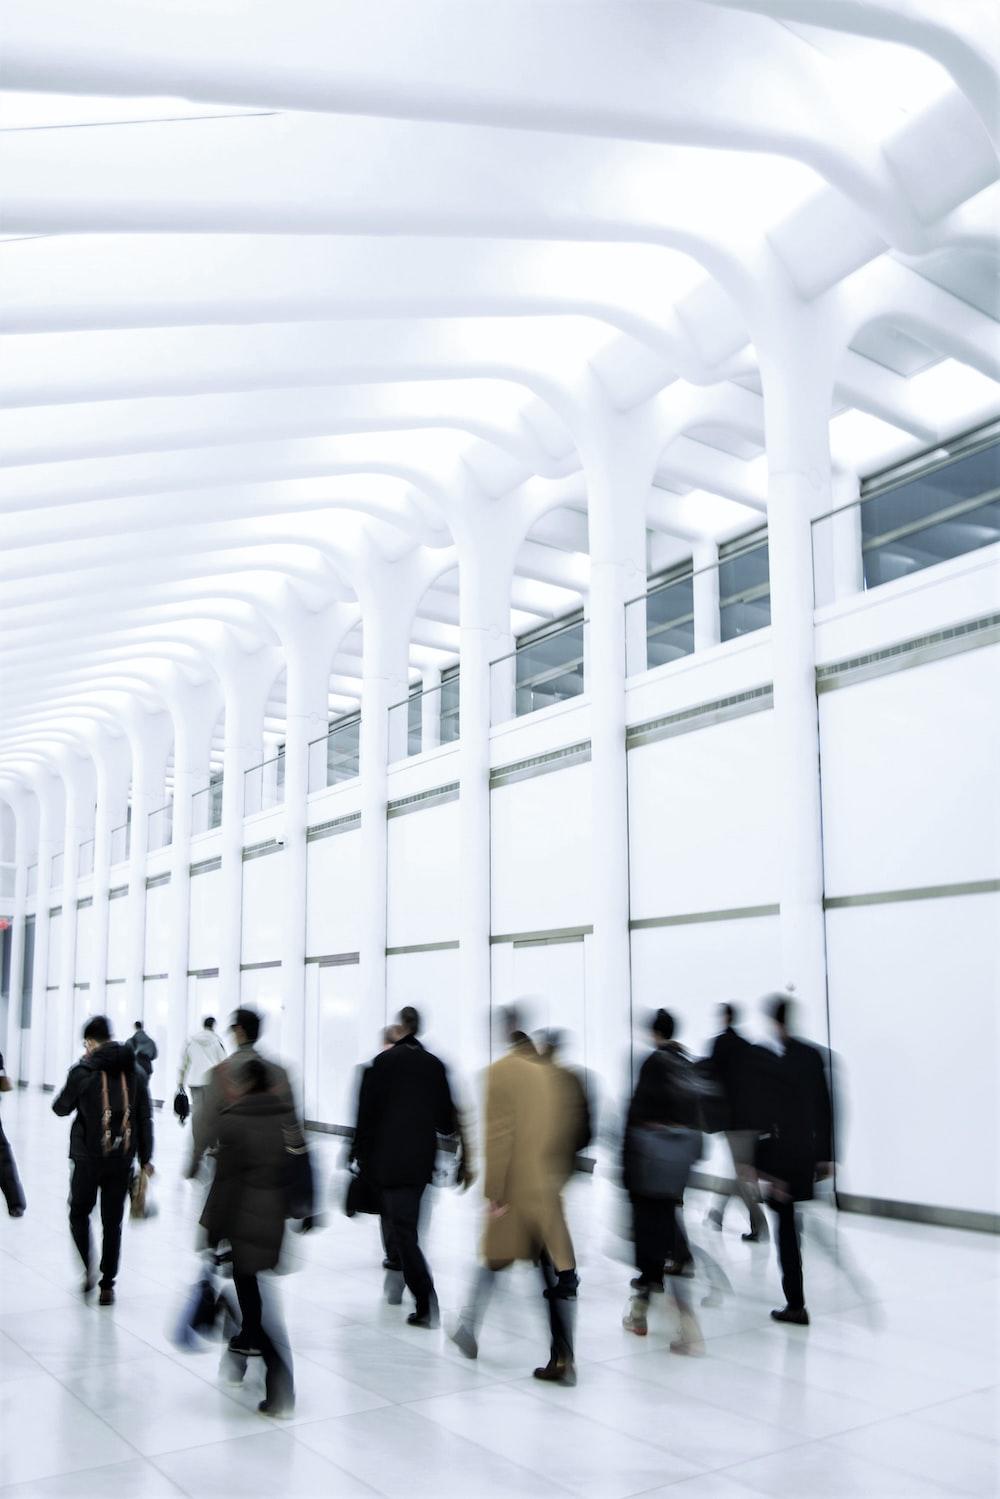 people walking on white hallway